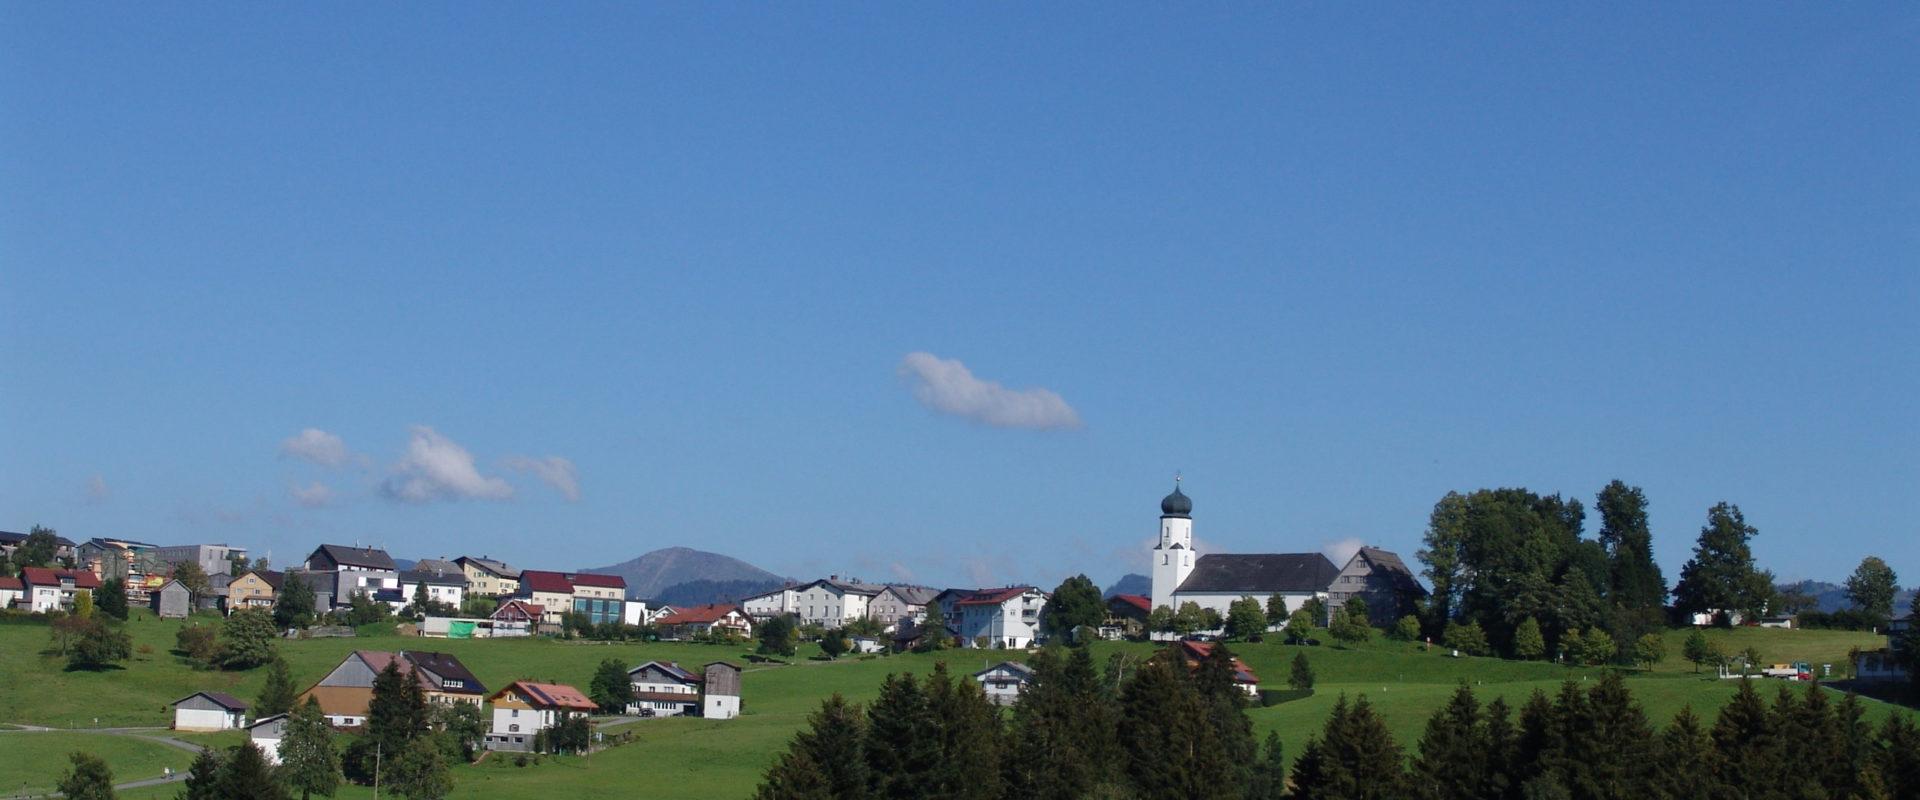 Sulzberg © Erwin Steurer / Gemeinde Sulzberg